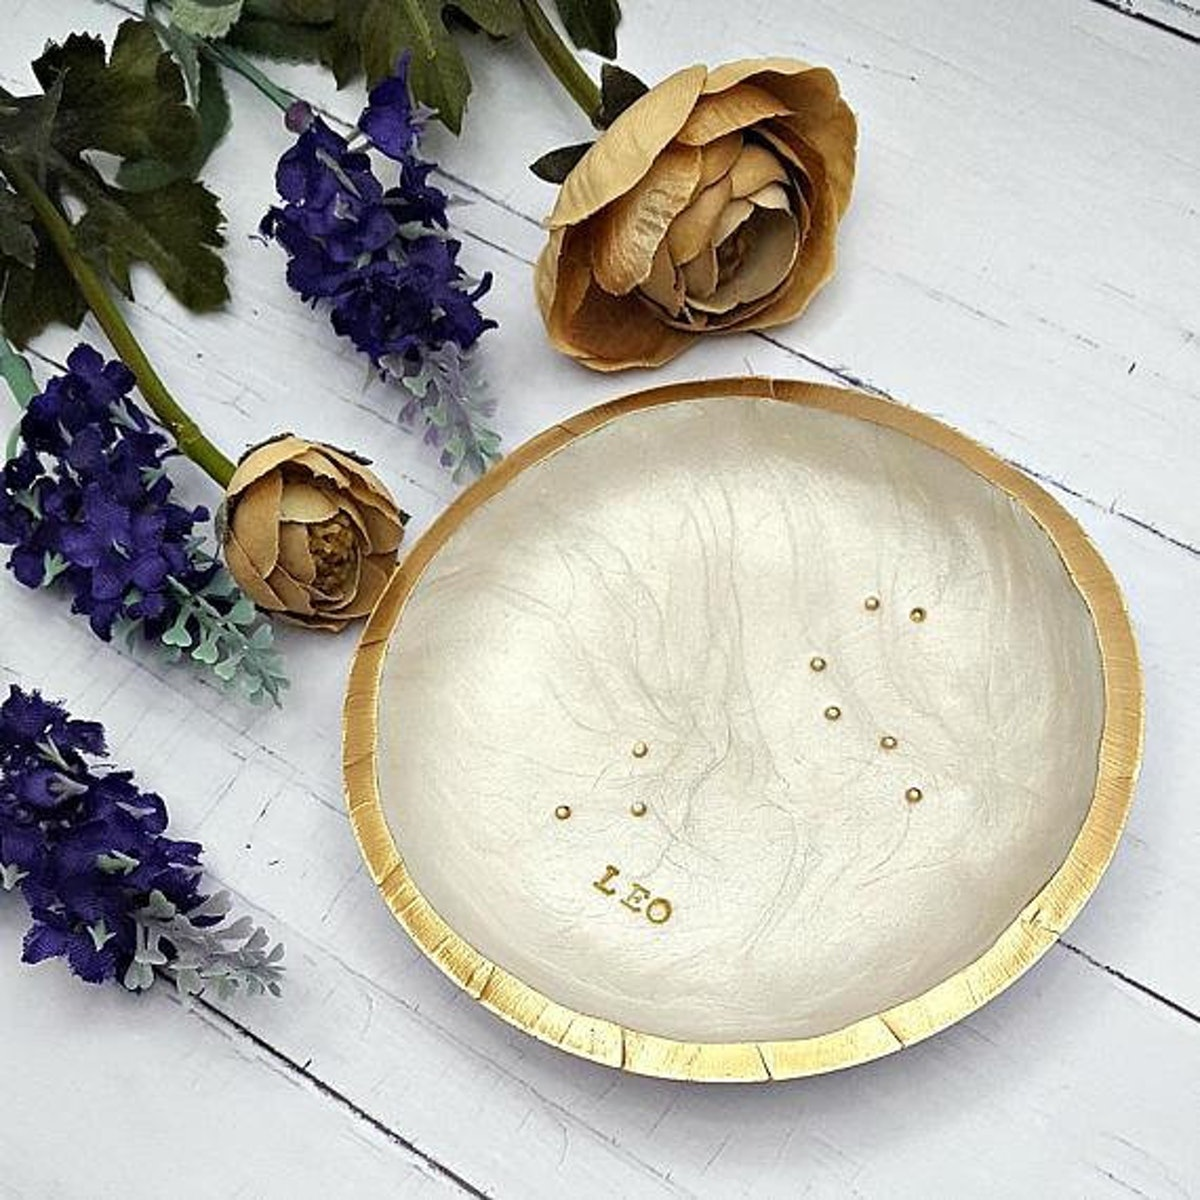 Zodiac Constellation Ring Dish